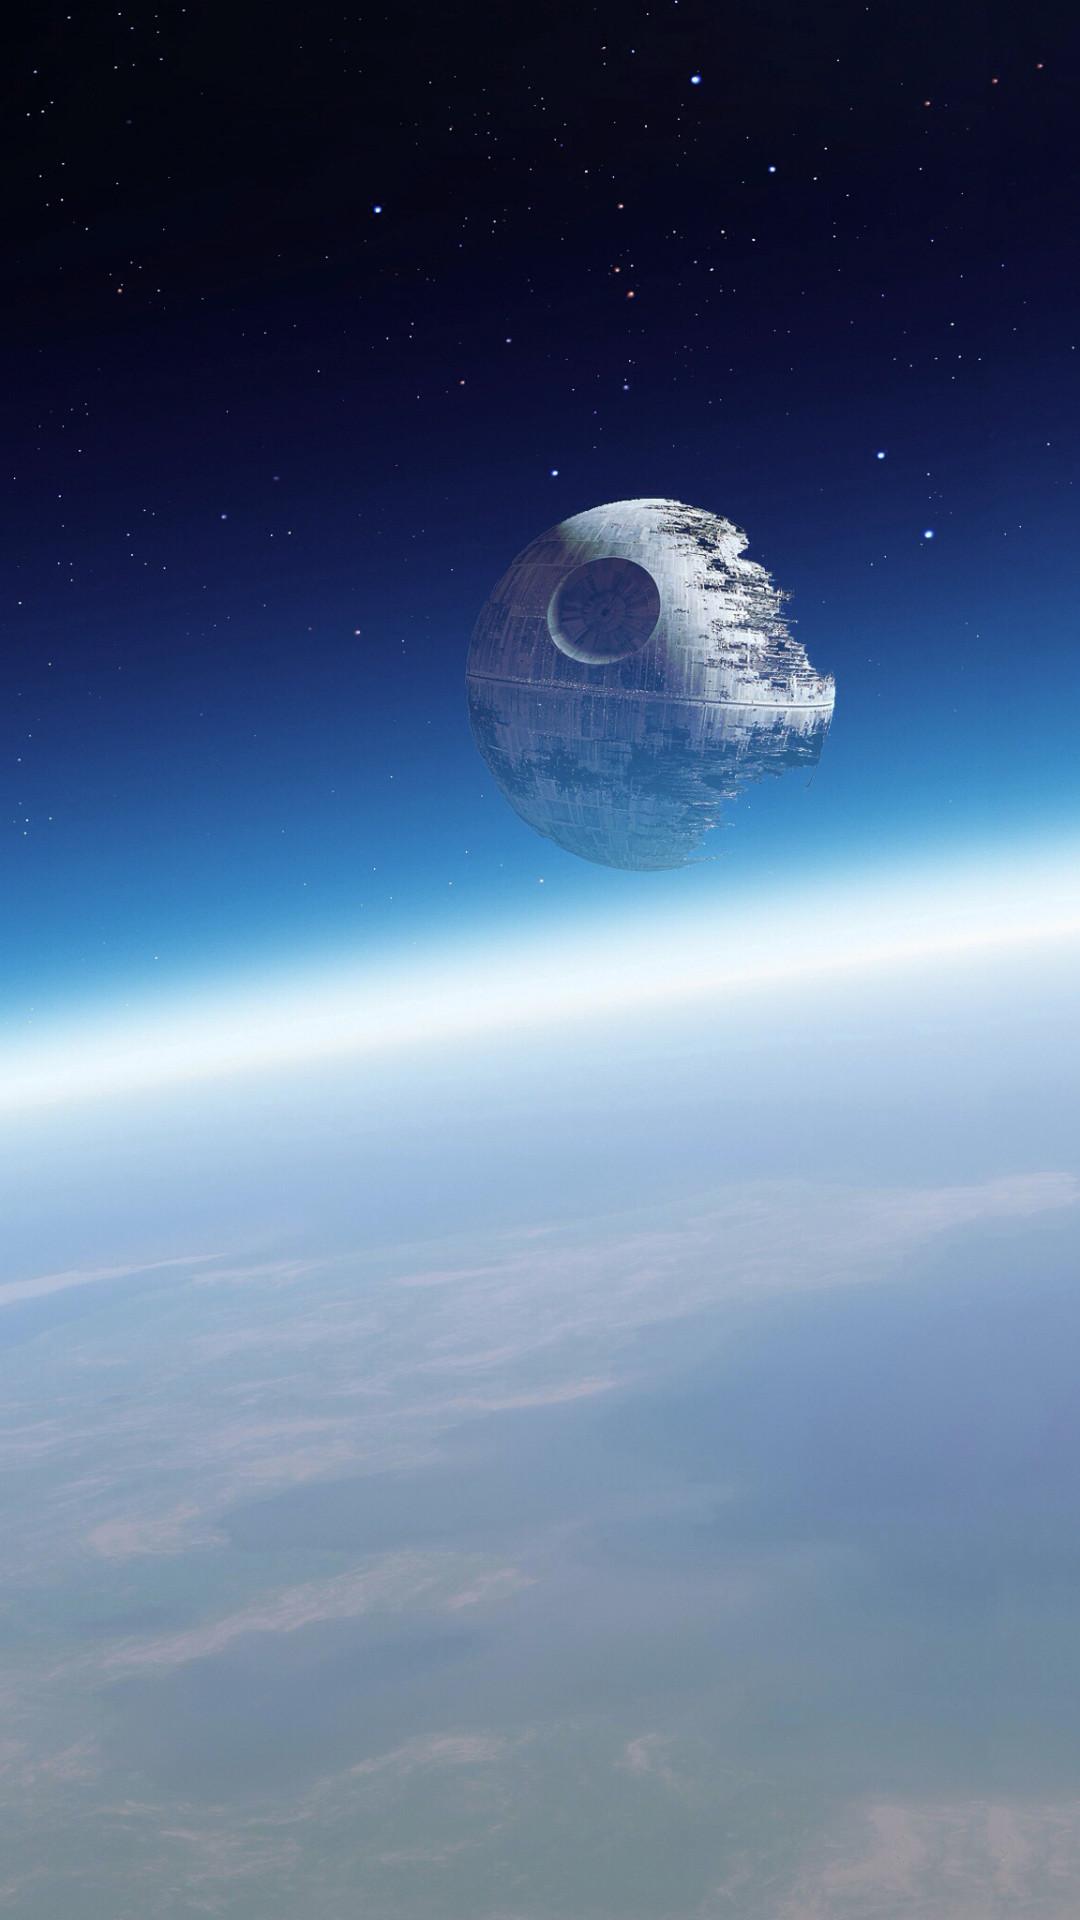 Death Star Wallpaper Iphone Space deathstar wallpaper